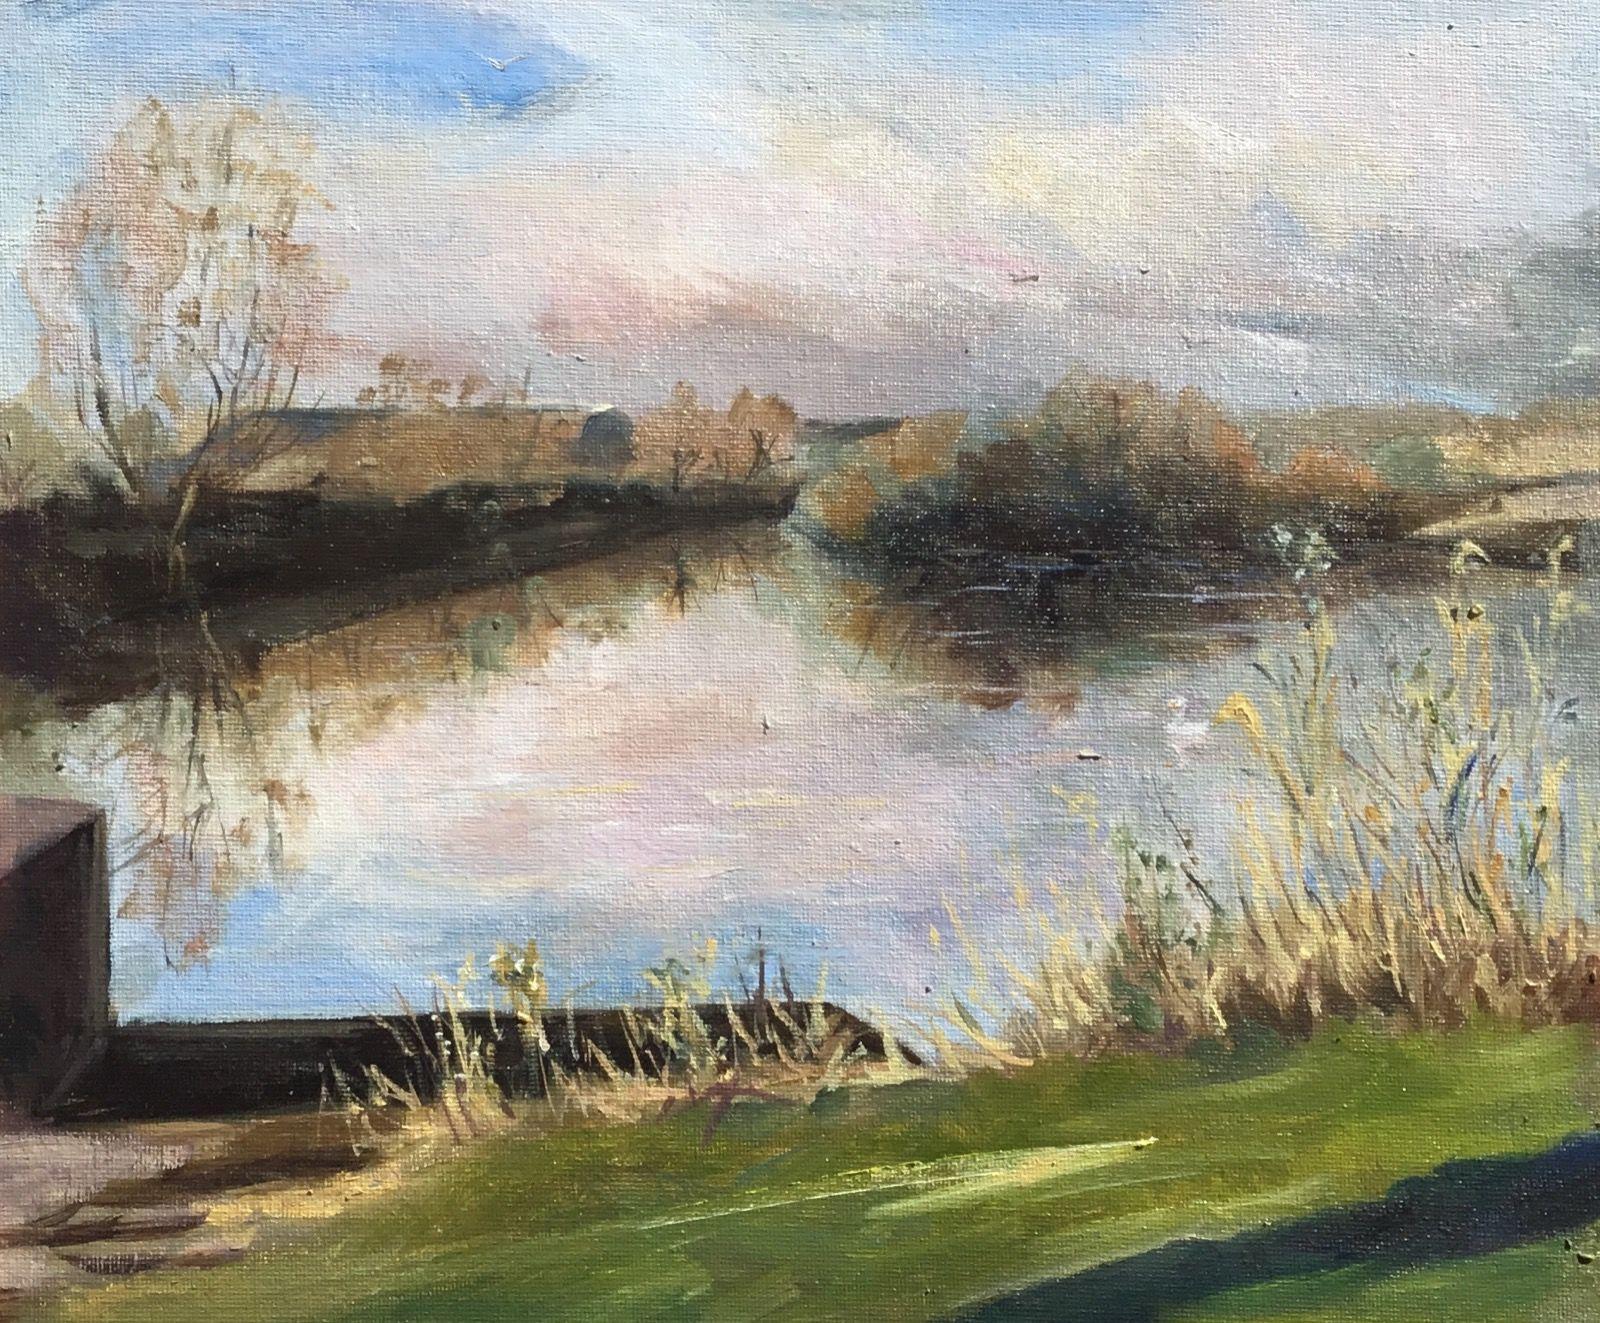 Solo Swan, Tewkesbury.